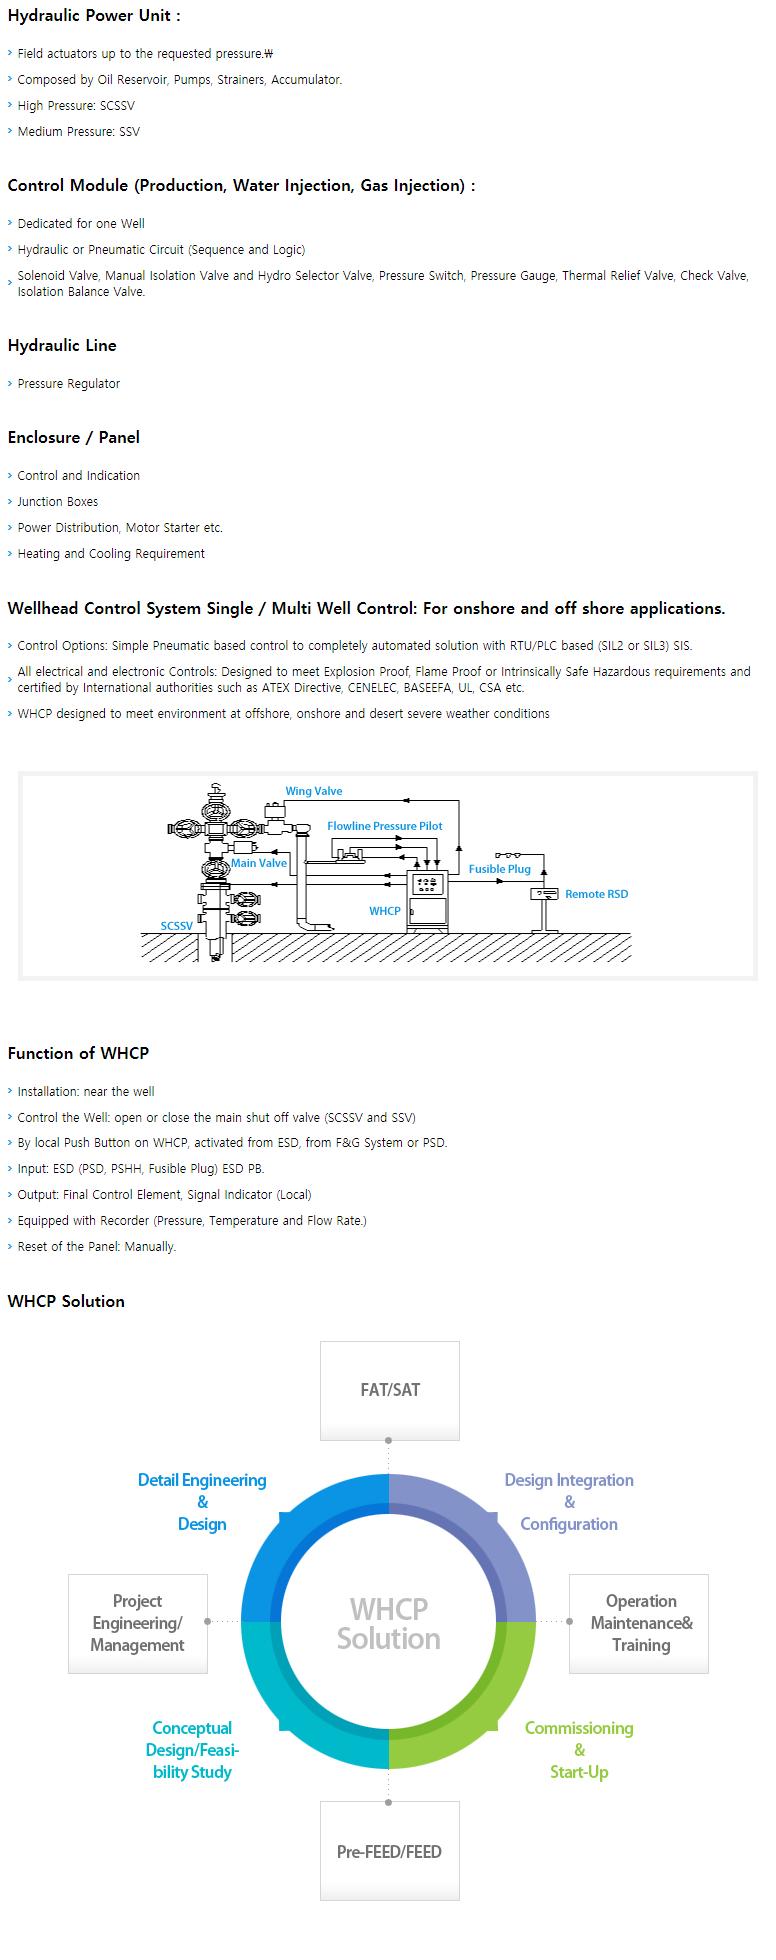 HISCO - Wellhead Control System Integration, Field